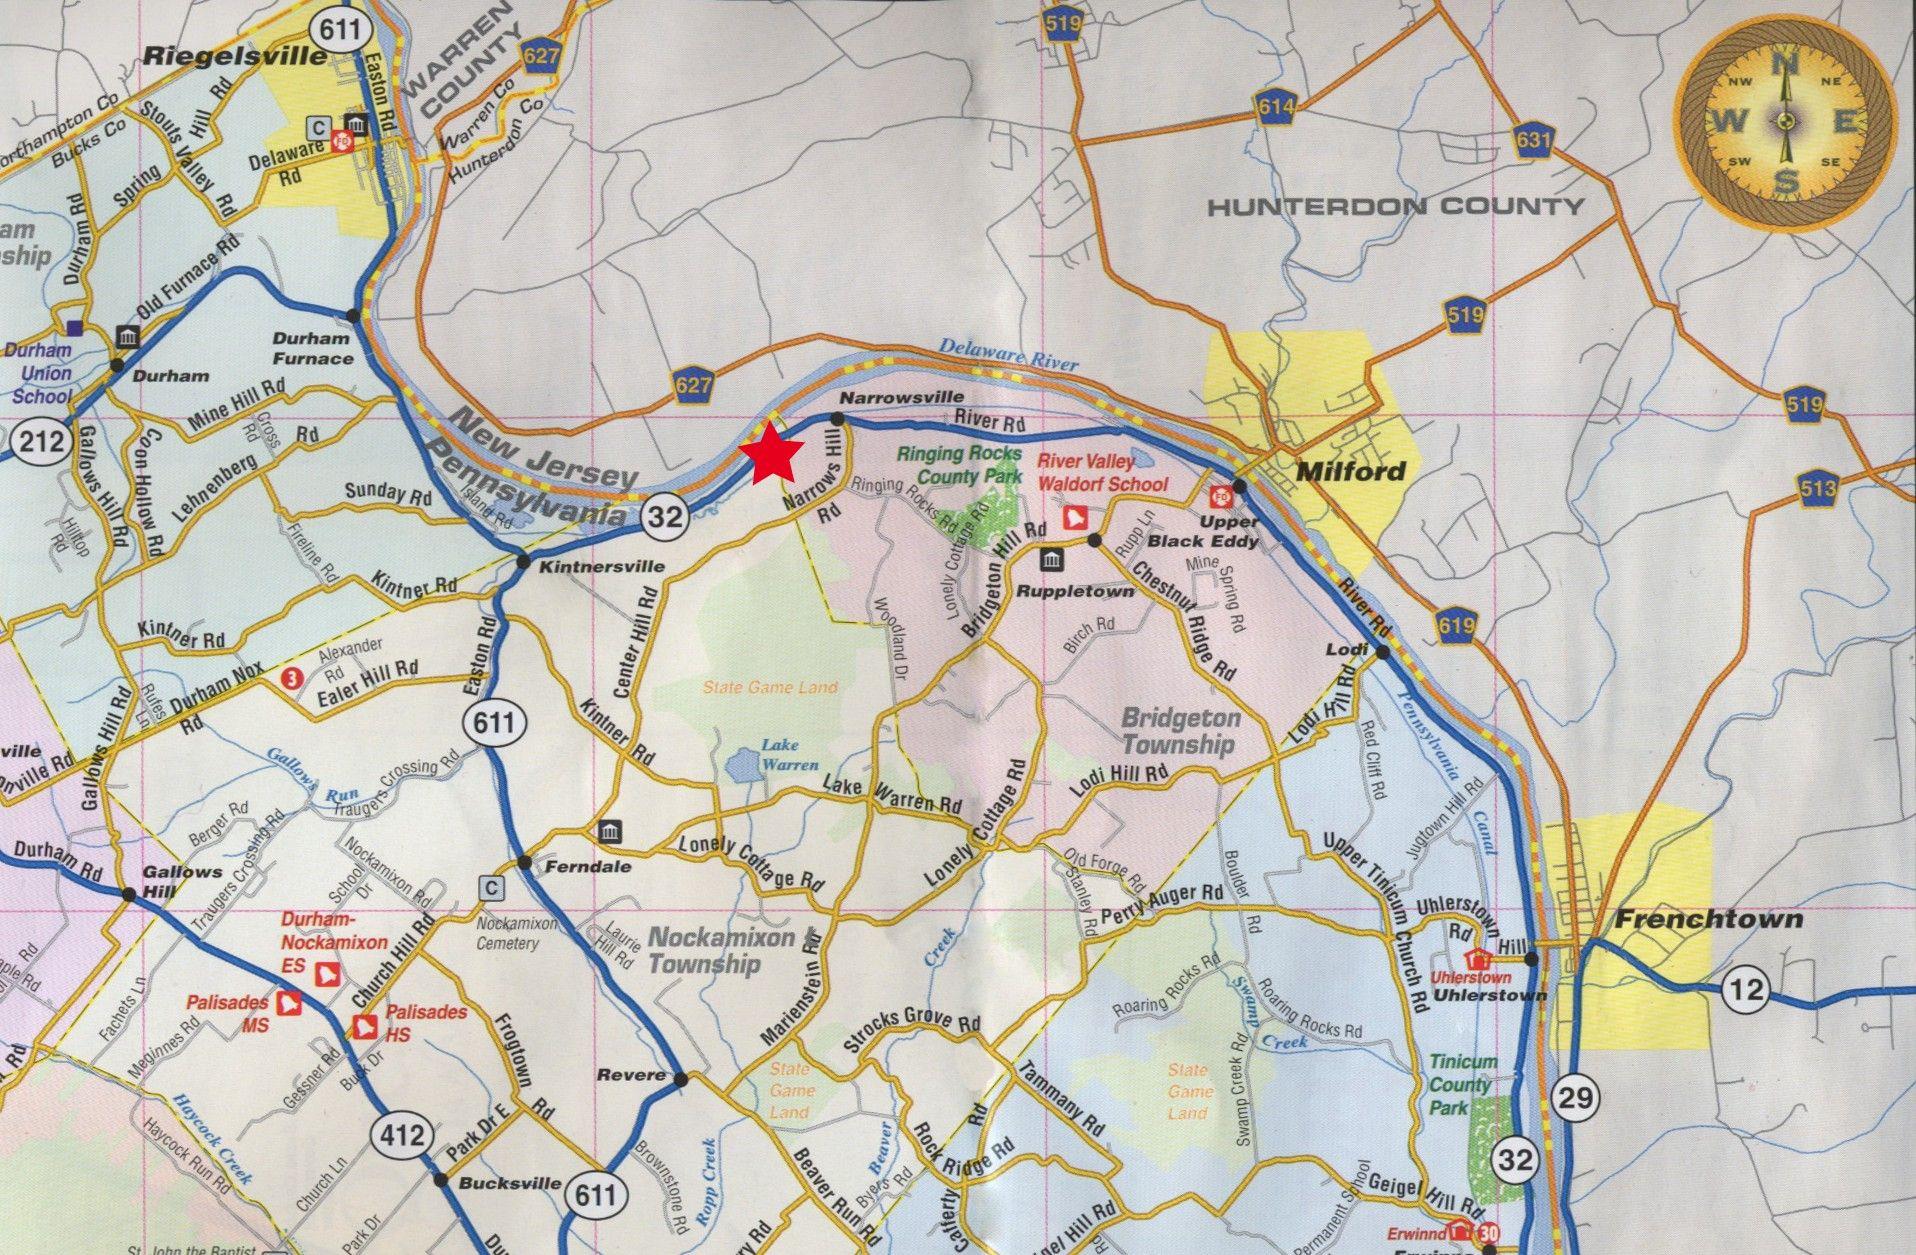 Bucks County Pa Road Map Upper Bucks County Pennsylvania Tourist